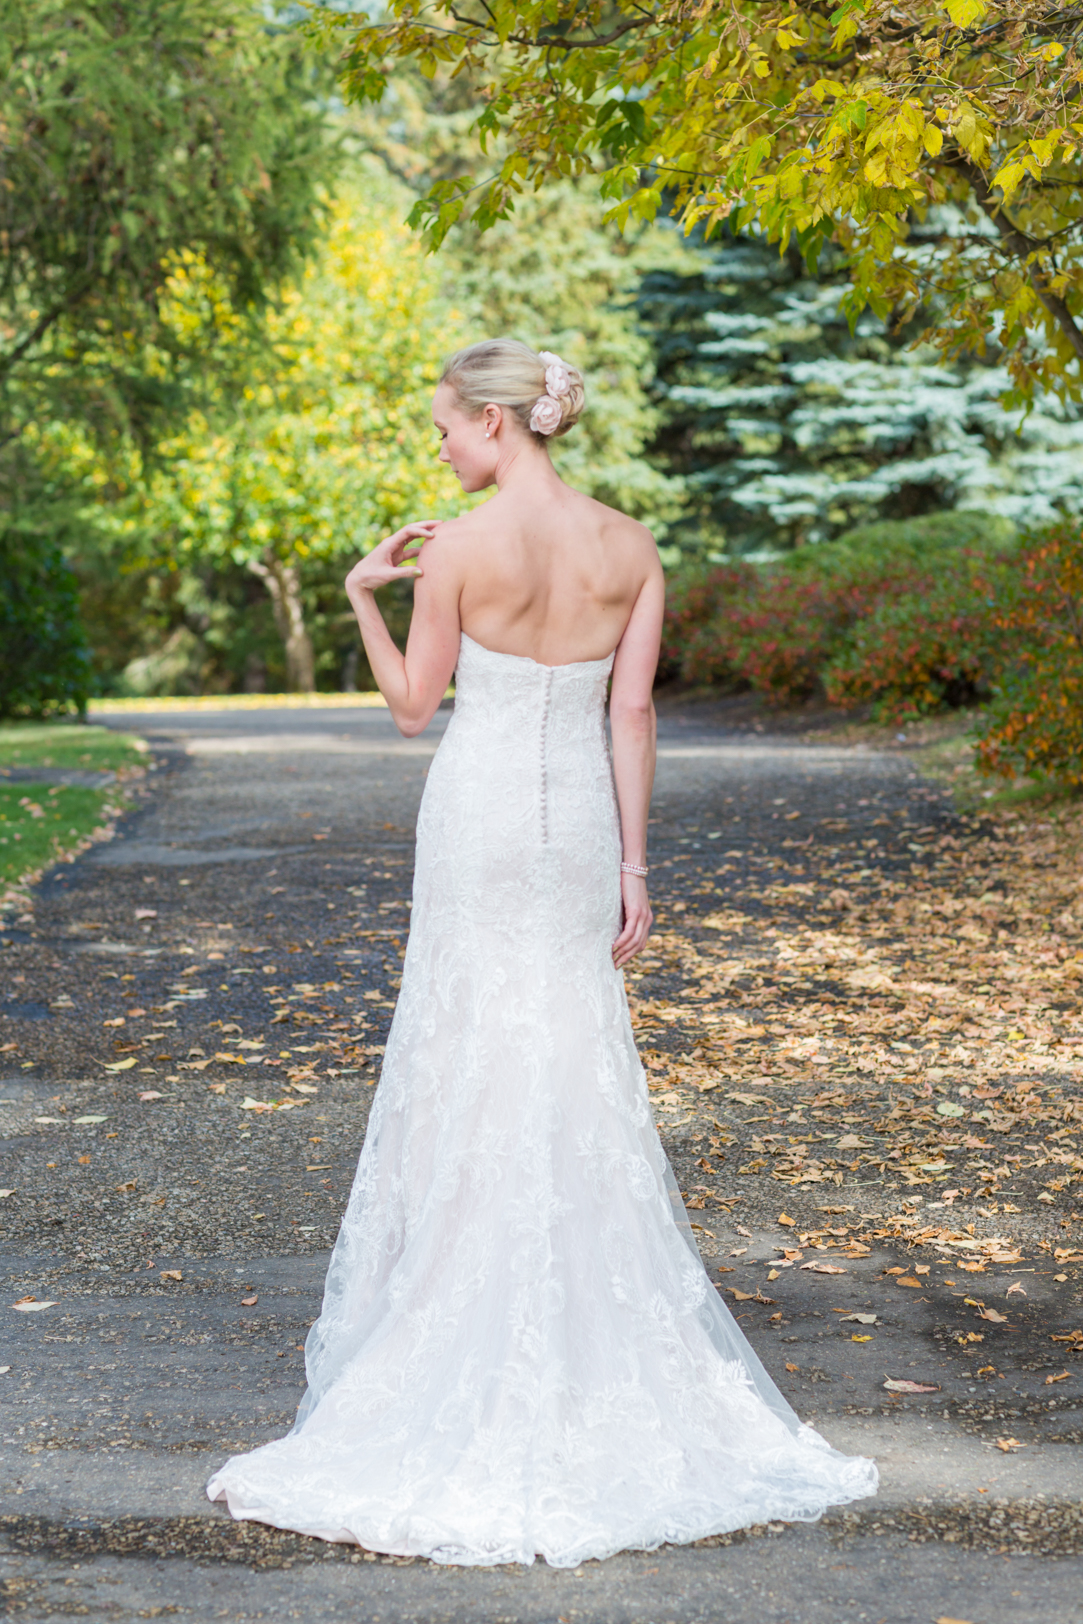 Bride's wedding portrait University of Alberta Botanic Garden